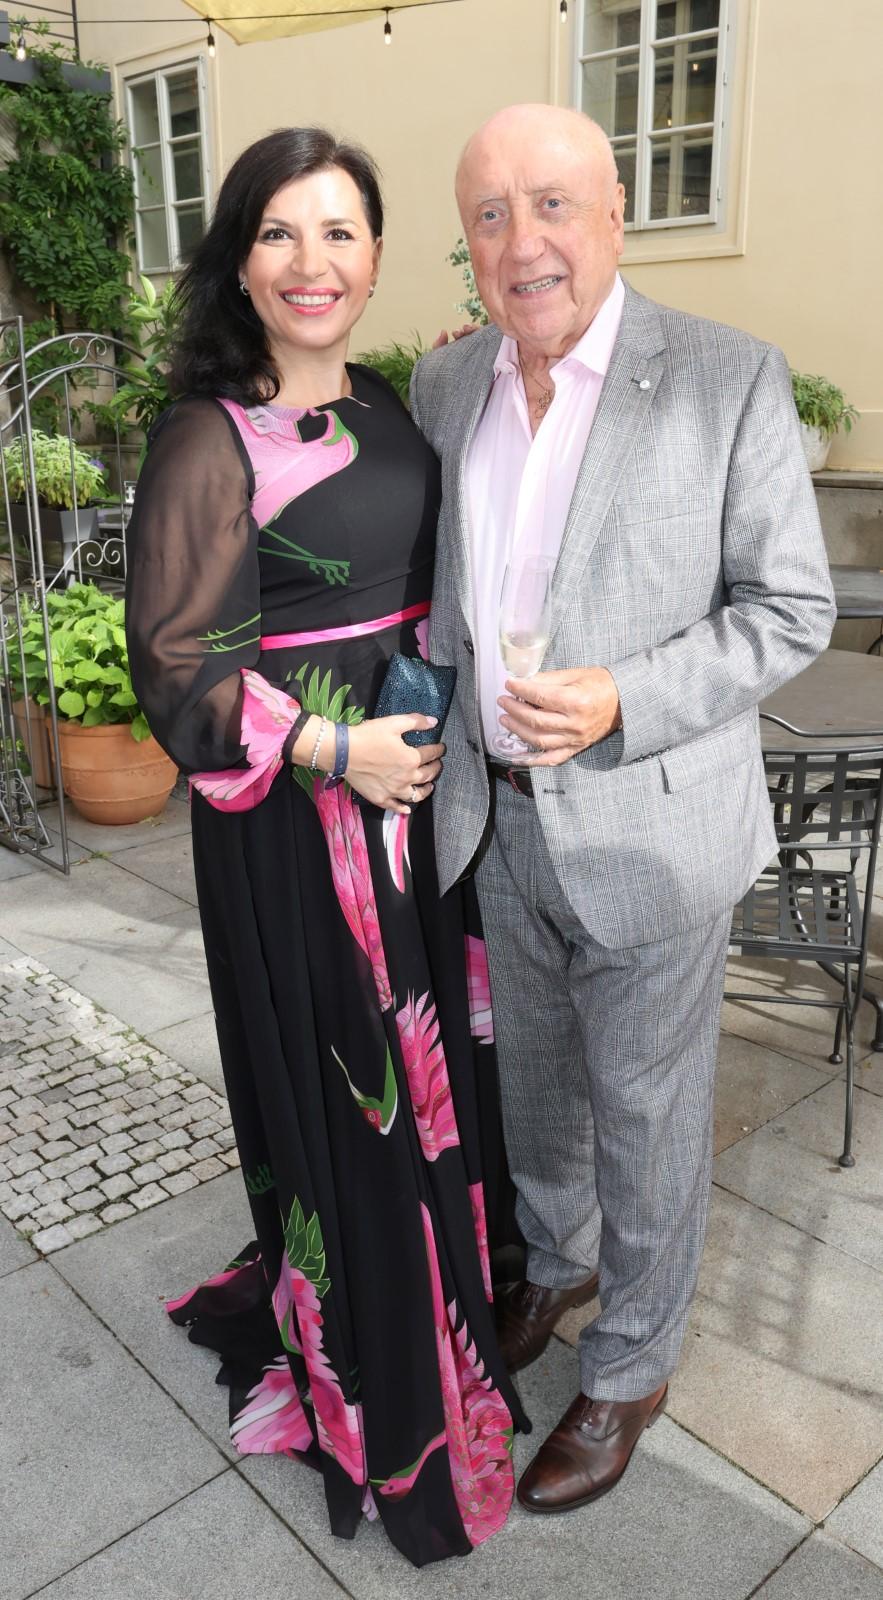 Mejdan ve Four Seasons: Andrea Kalivodová a Felix Slováček